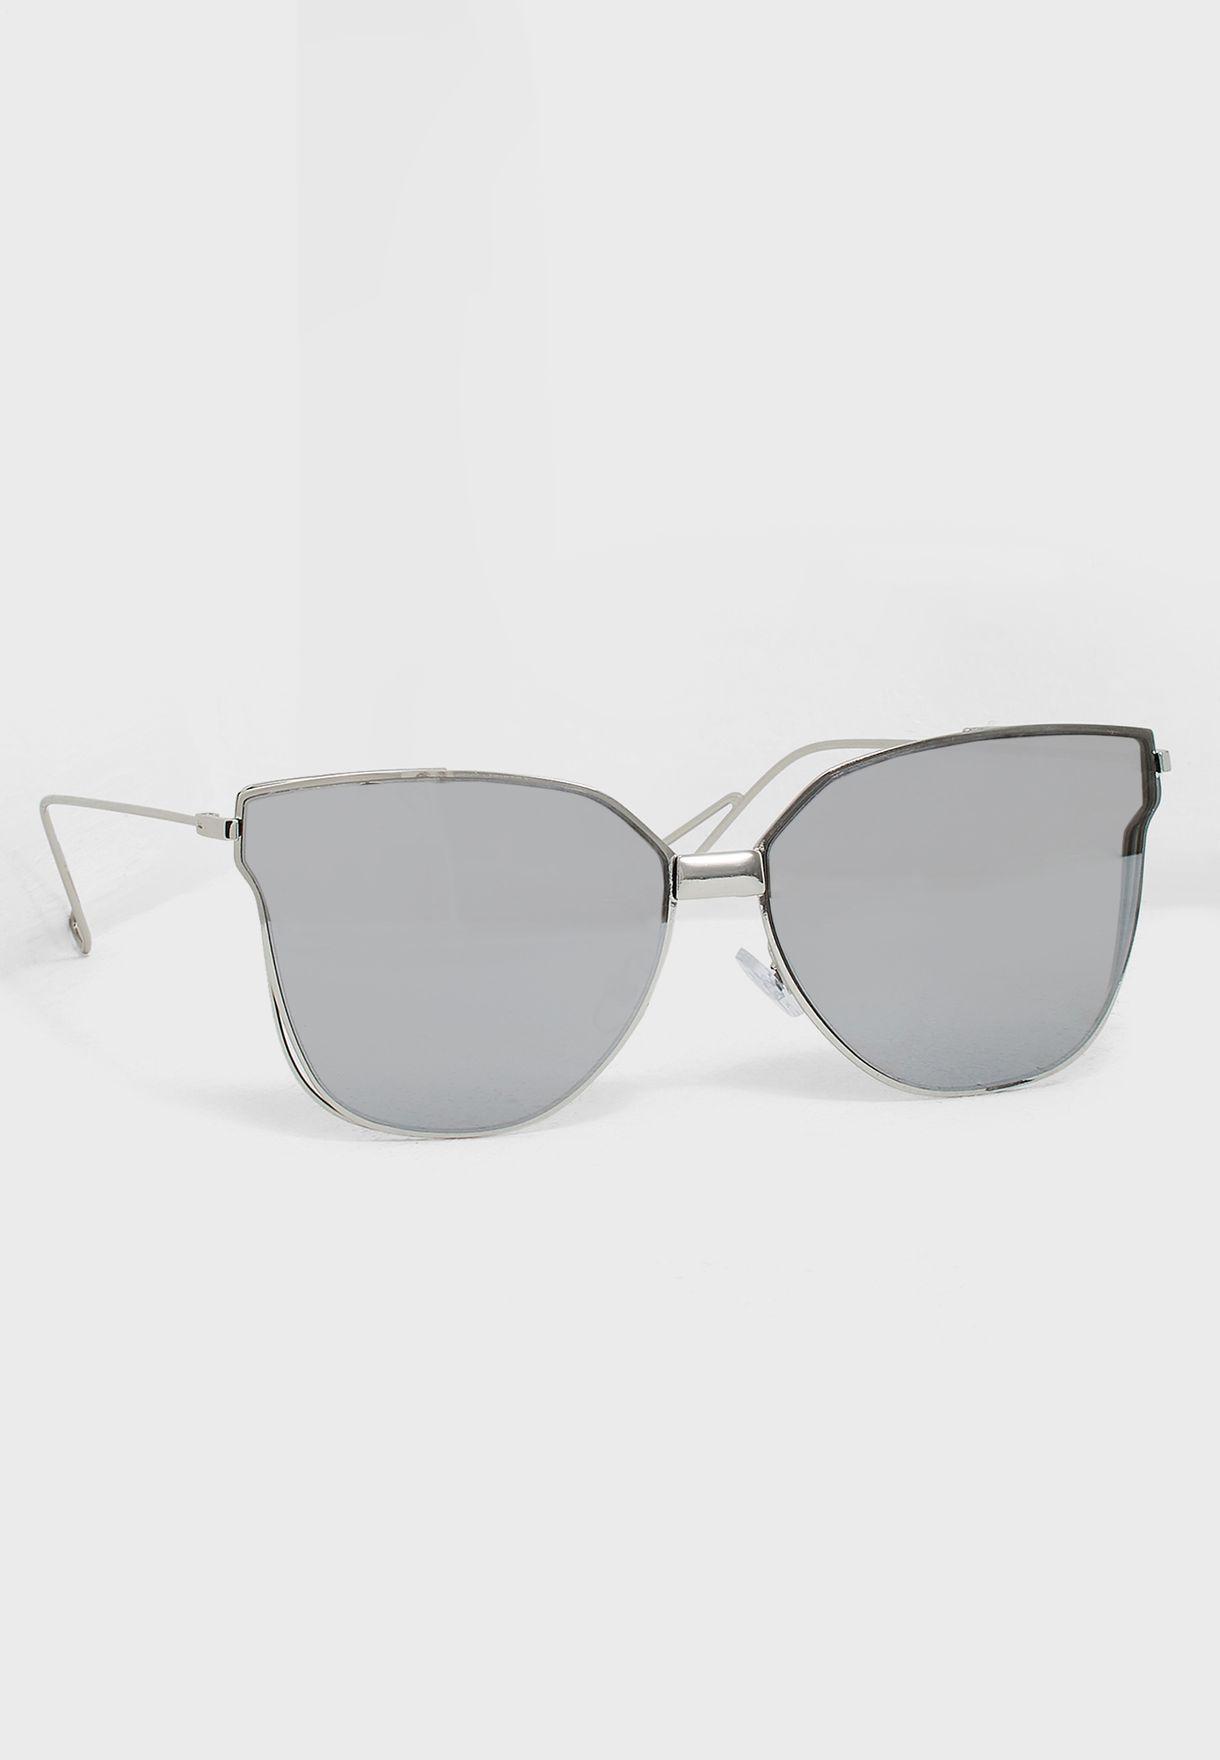 f3955406518 Shop South beach silver Cat Eye Flat Lens Sunglasses 4-FL-800 for ...